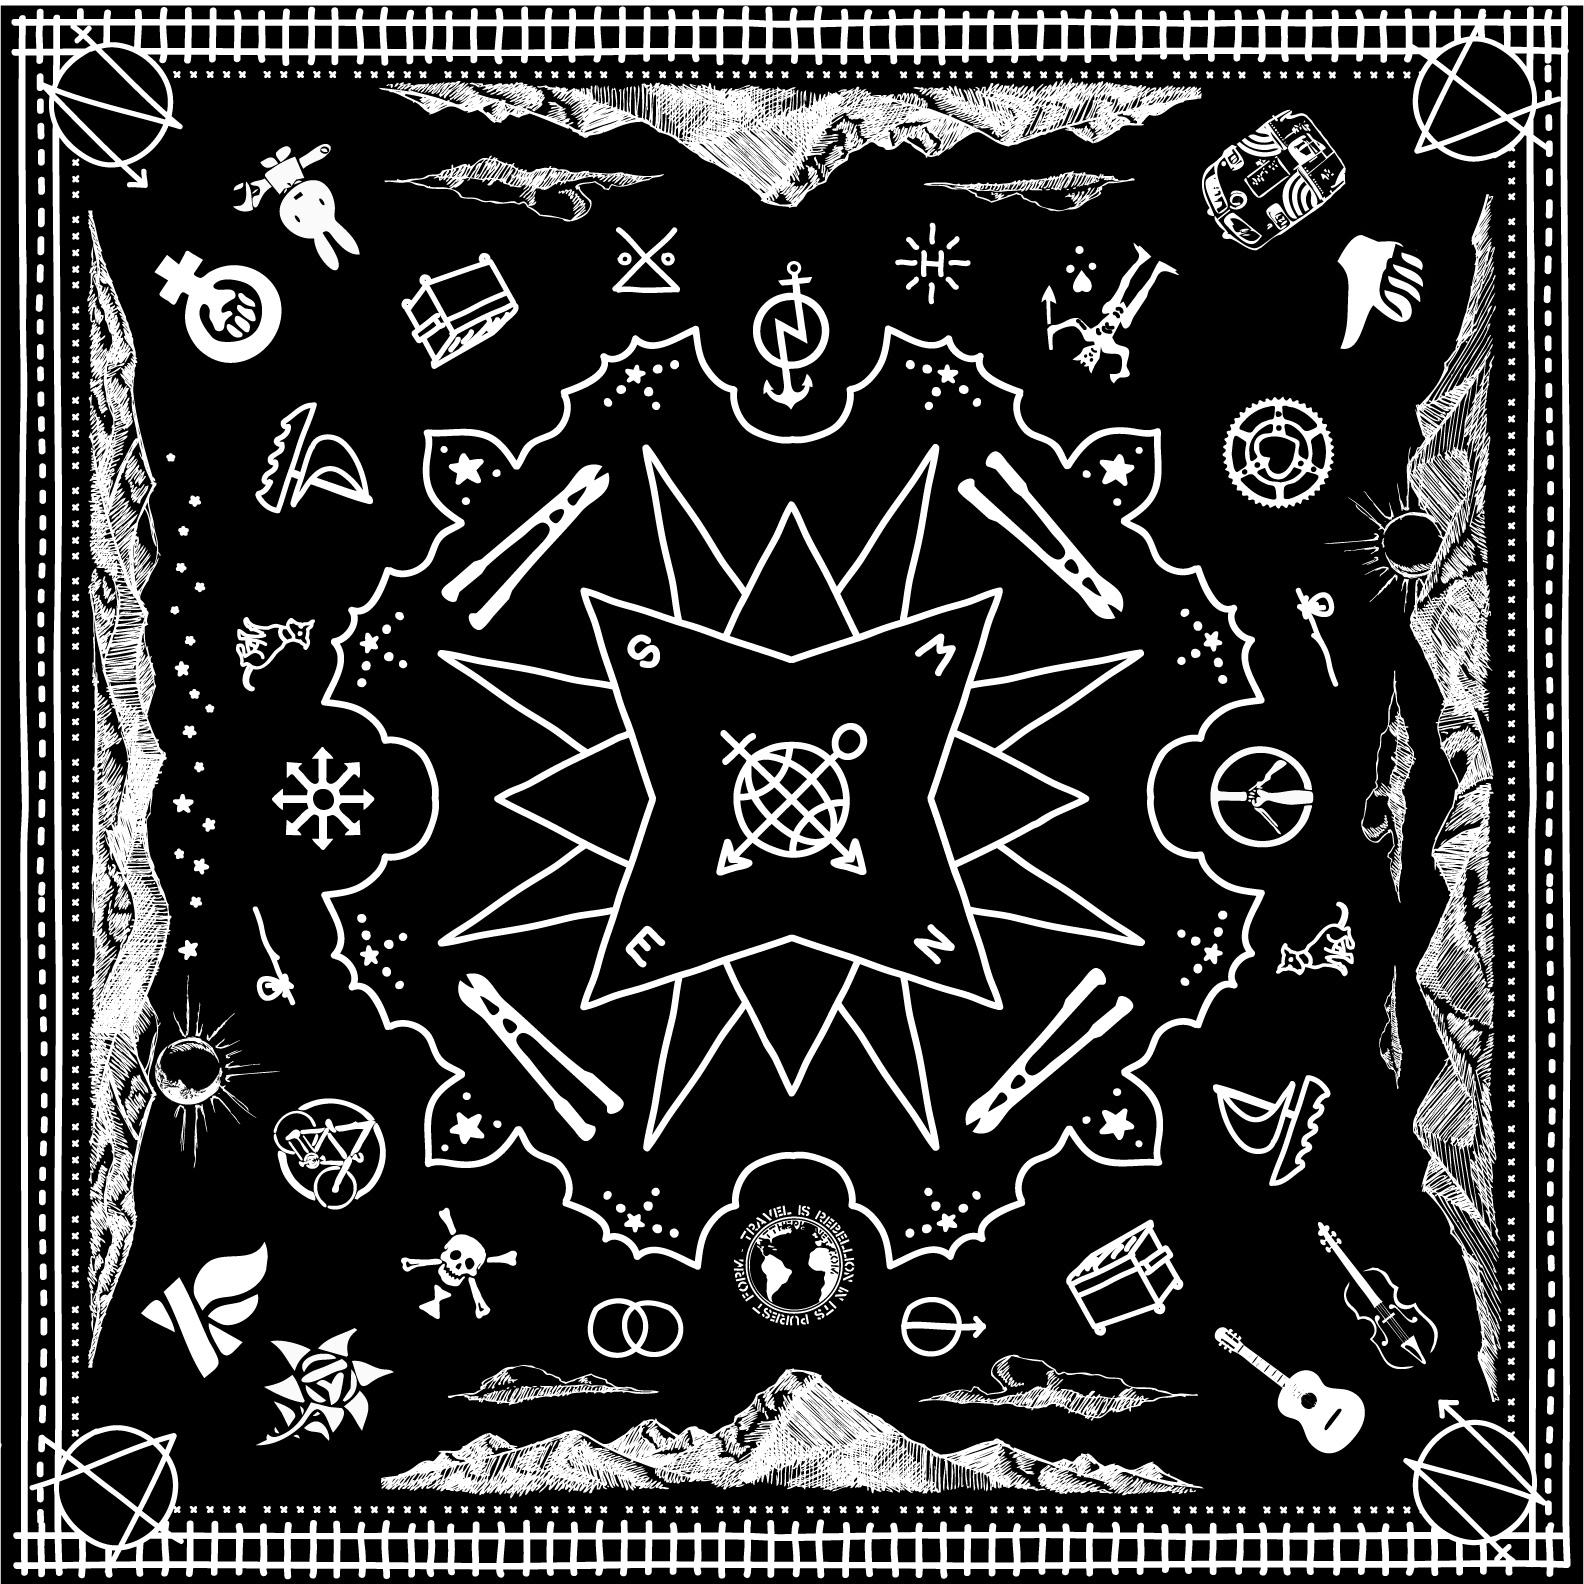 bandkerchief_stpv3-jpg.17770